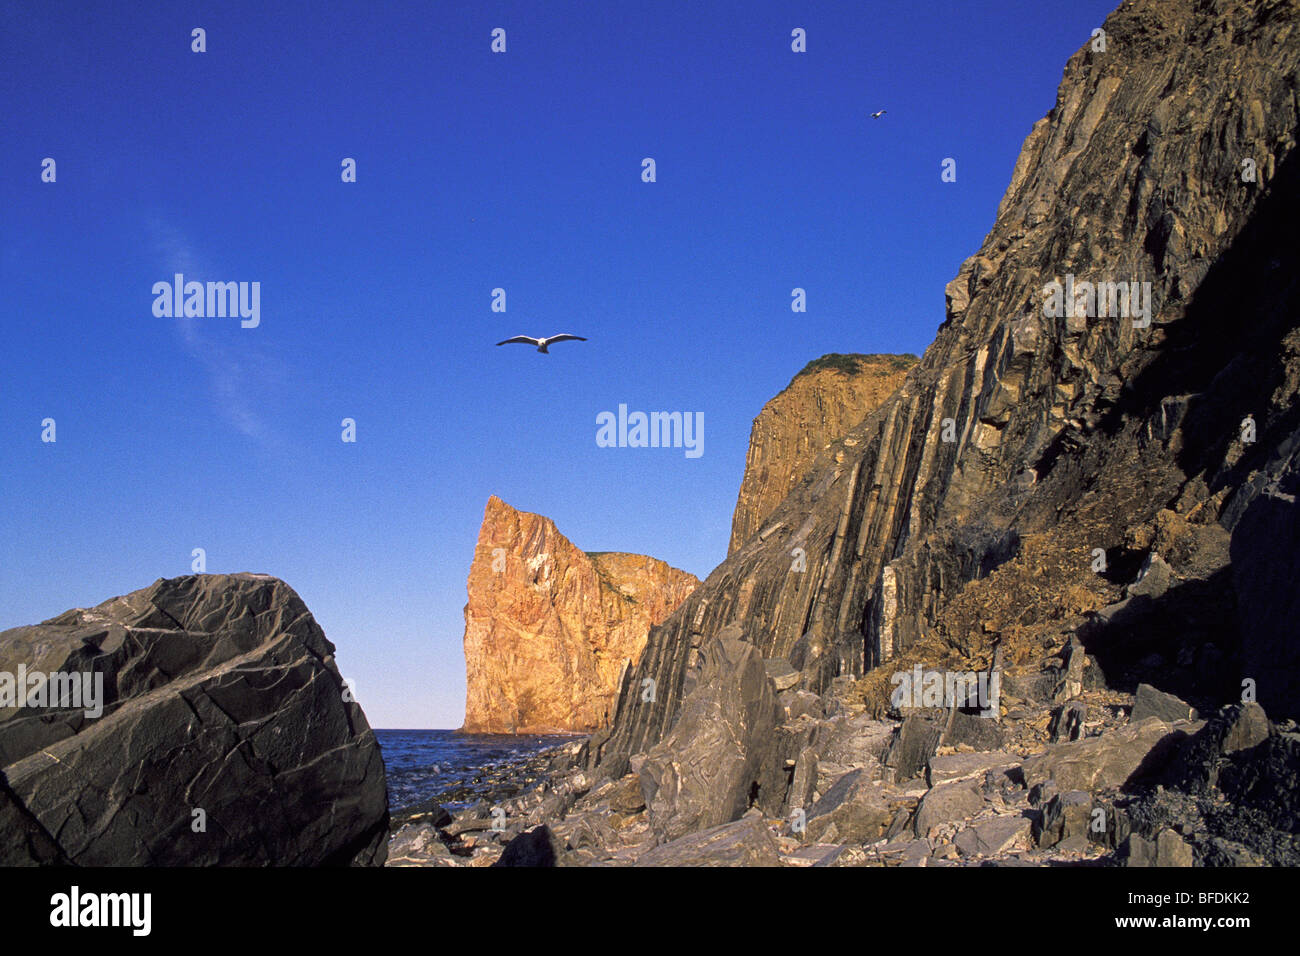 Seagulls flying above Perce Rock, Perce, Gaspe, Quebec, Canada - Stock Image